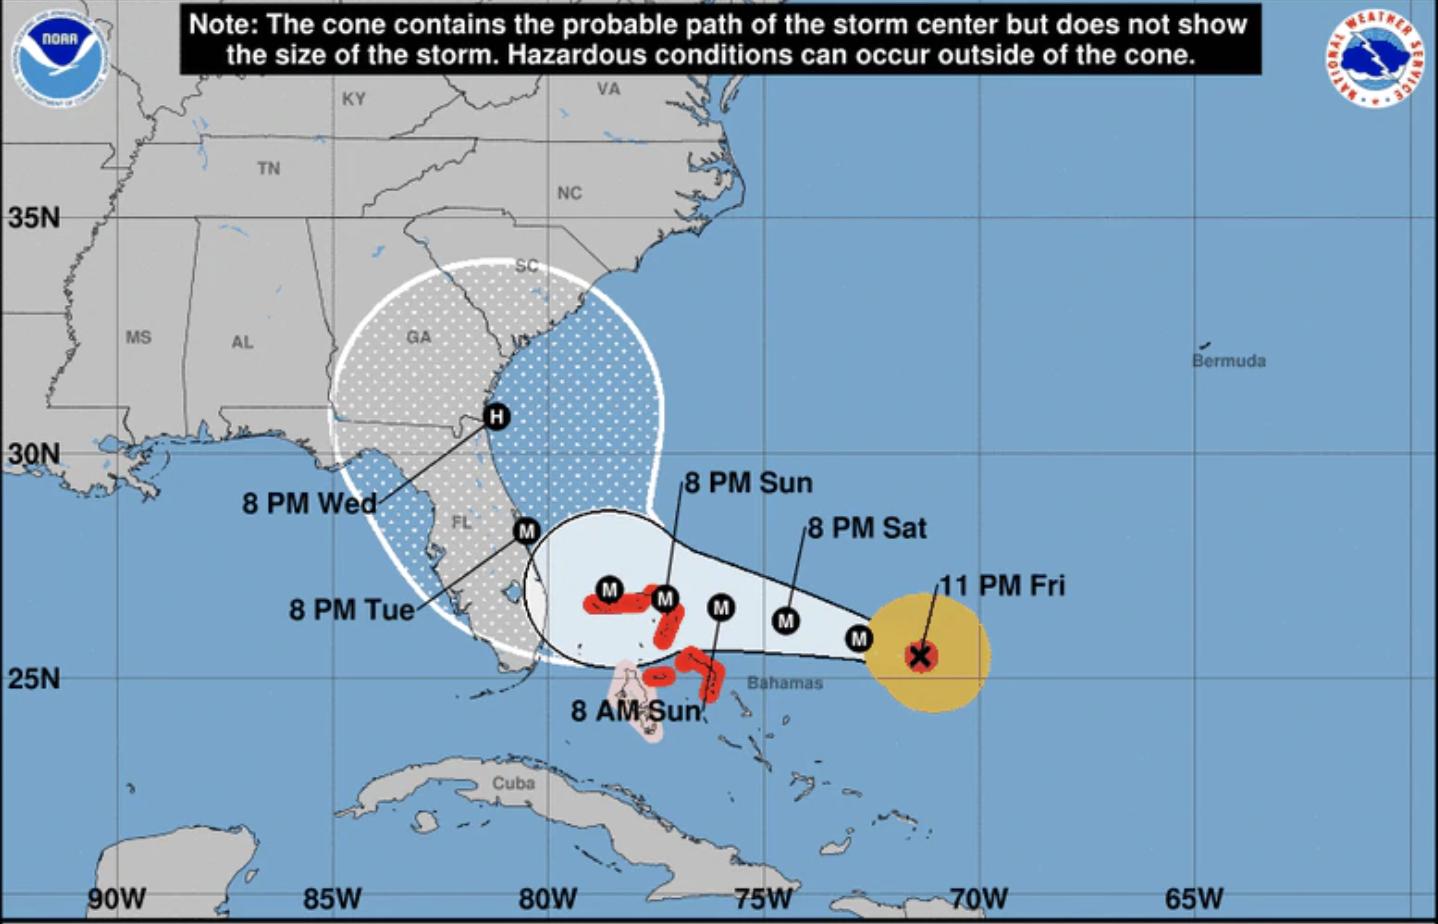 Photo courtesy of the National Hurricane Center